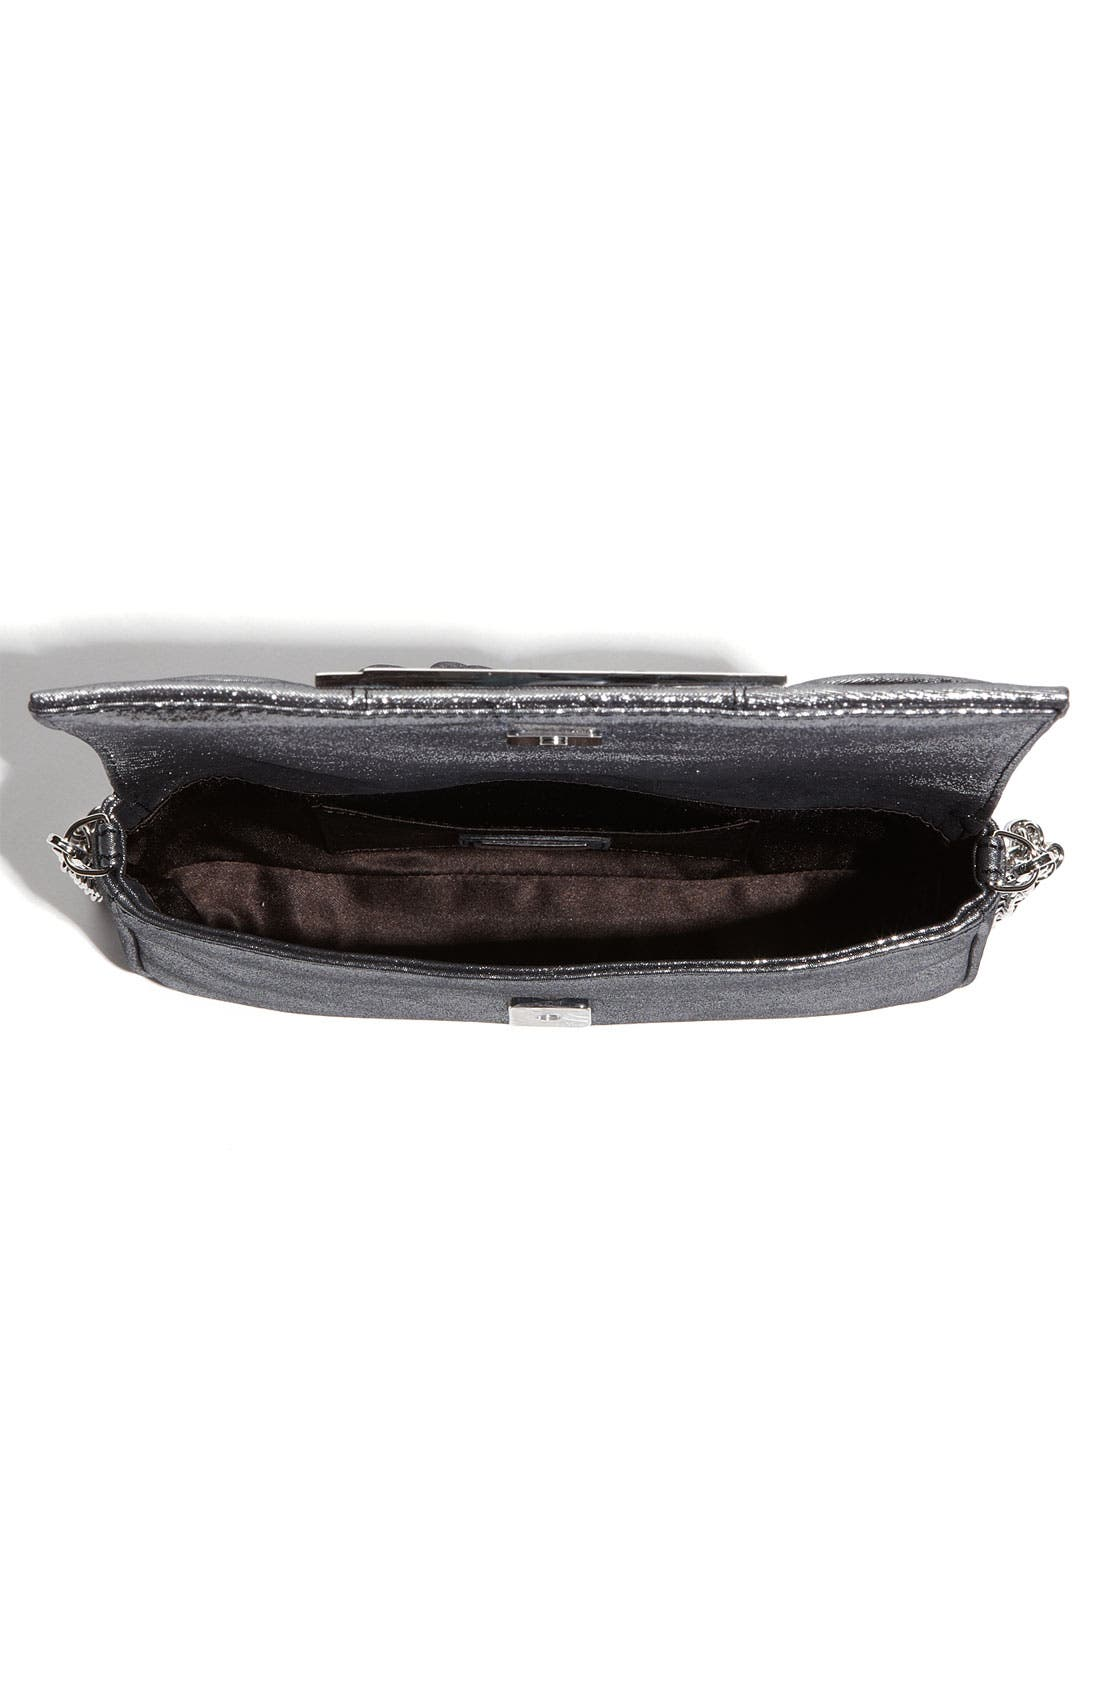 Alternate Image 3  - Fendi 'Mia' Evening Bag